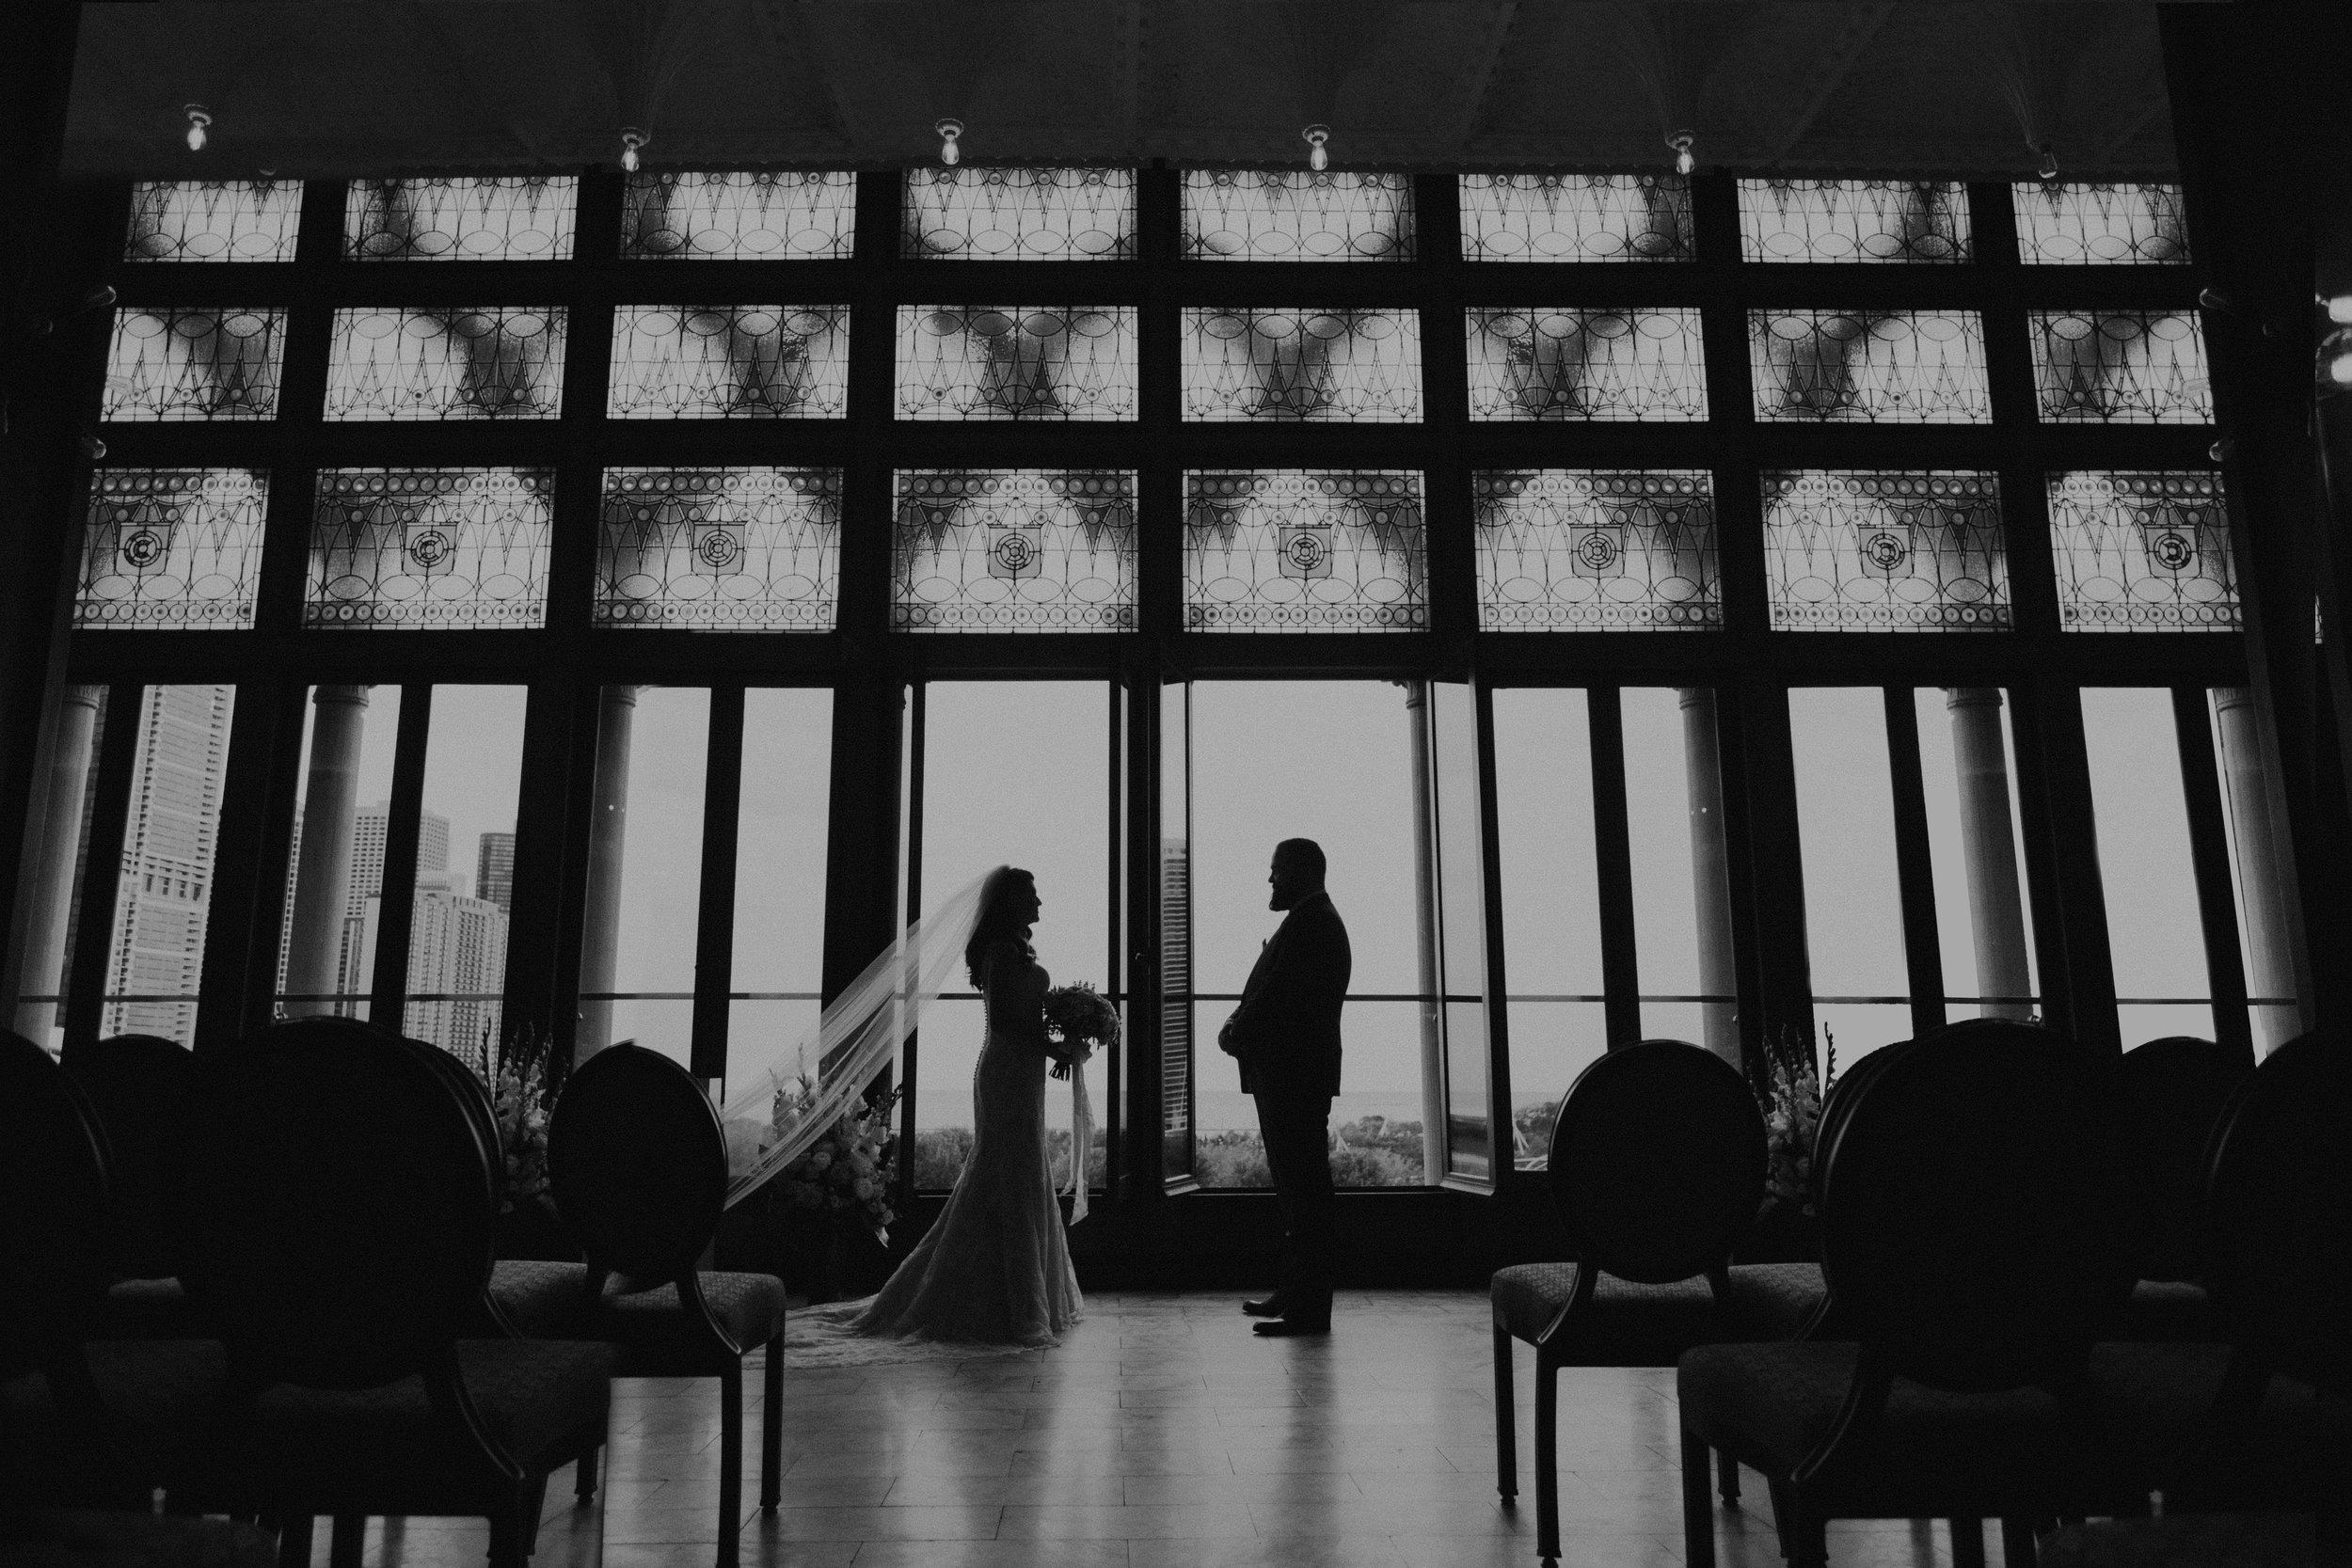 Classic Chicago Wedding - Venue: Chicago Athletic Association HotelHair/Makeup: Rare Bird BeautiesDress: The Kirstie by Maggie SotteroFlowers: A Pretty Flower